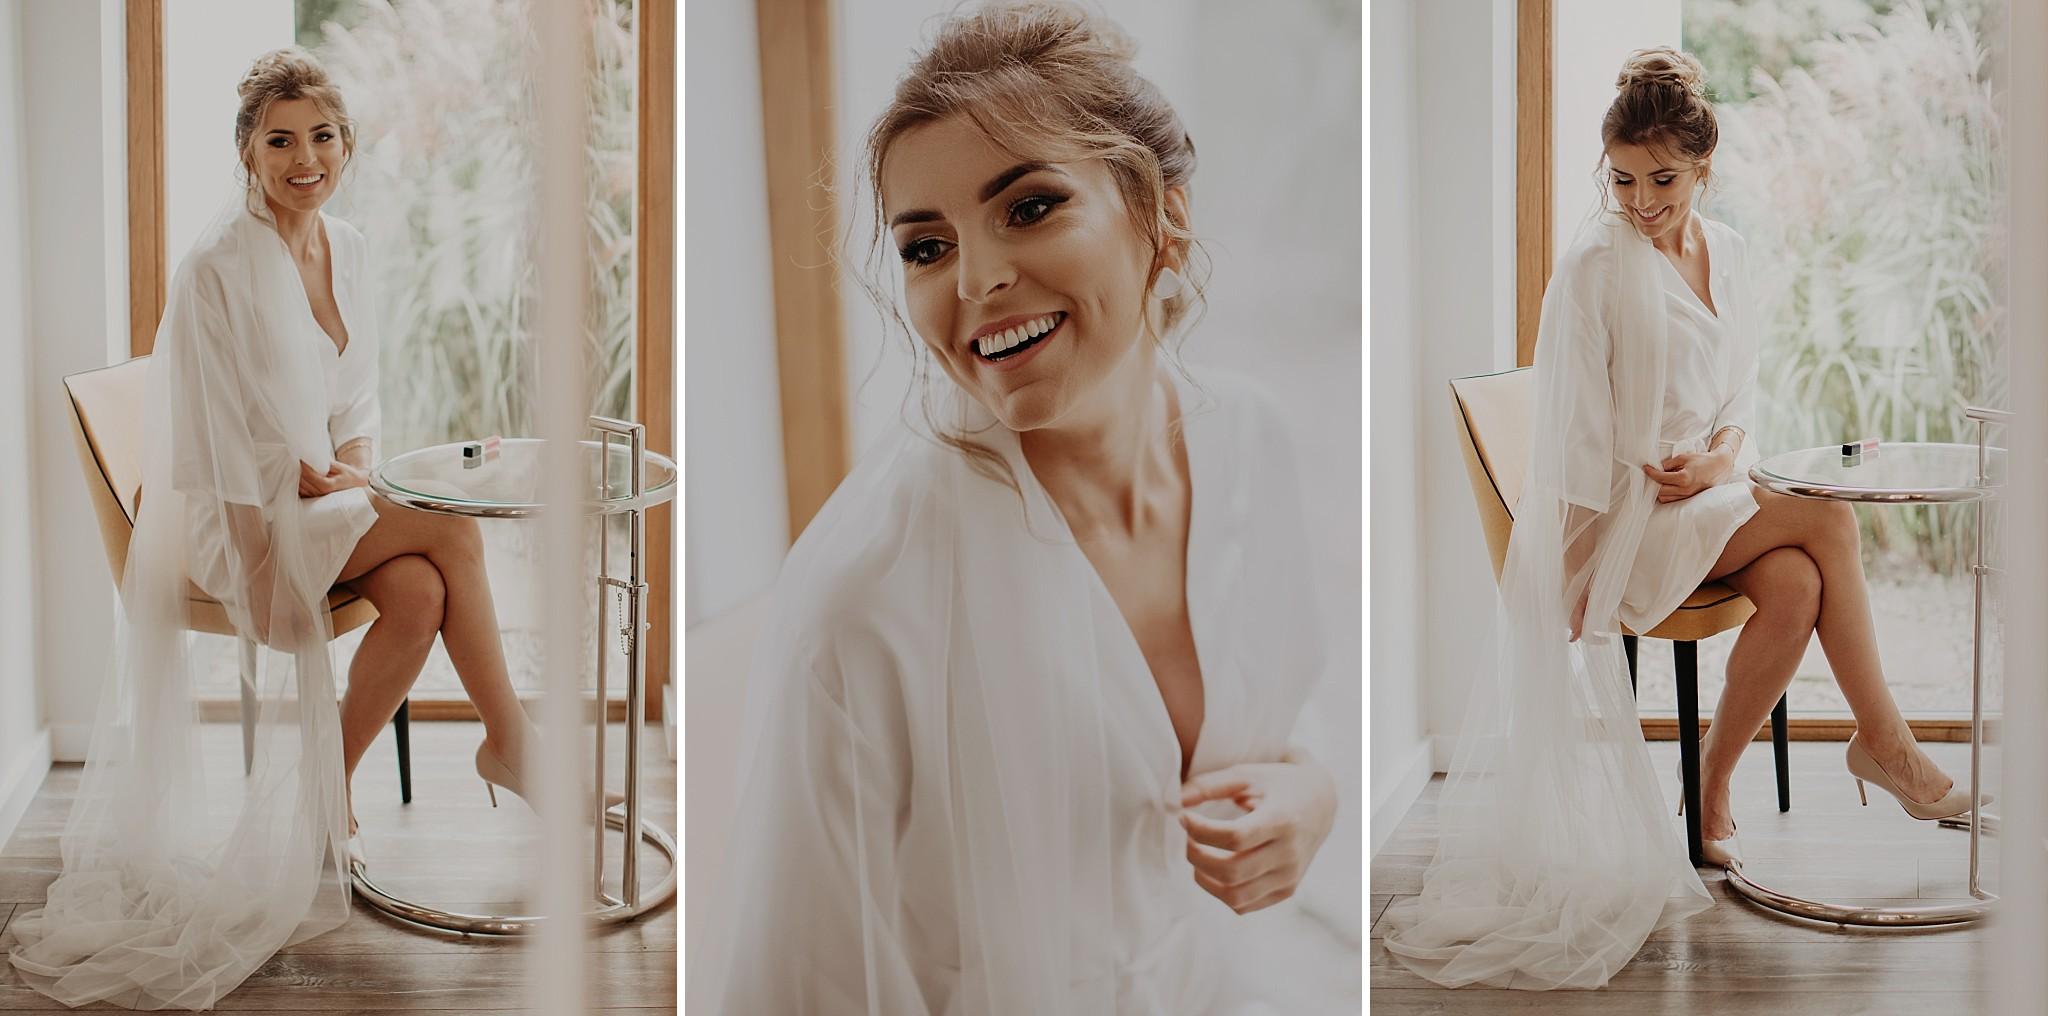 fotograf poznan wesele dobra truskawka piekne wesele pod poznaniem wesele w dobrej truskawce piekna para mloda slub marzen slub koronawirus slub listopad wesele koronawirus 032